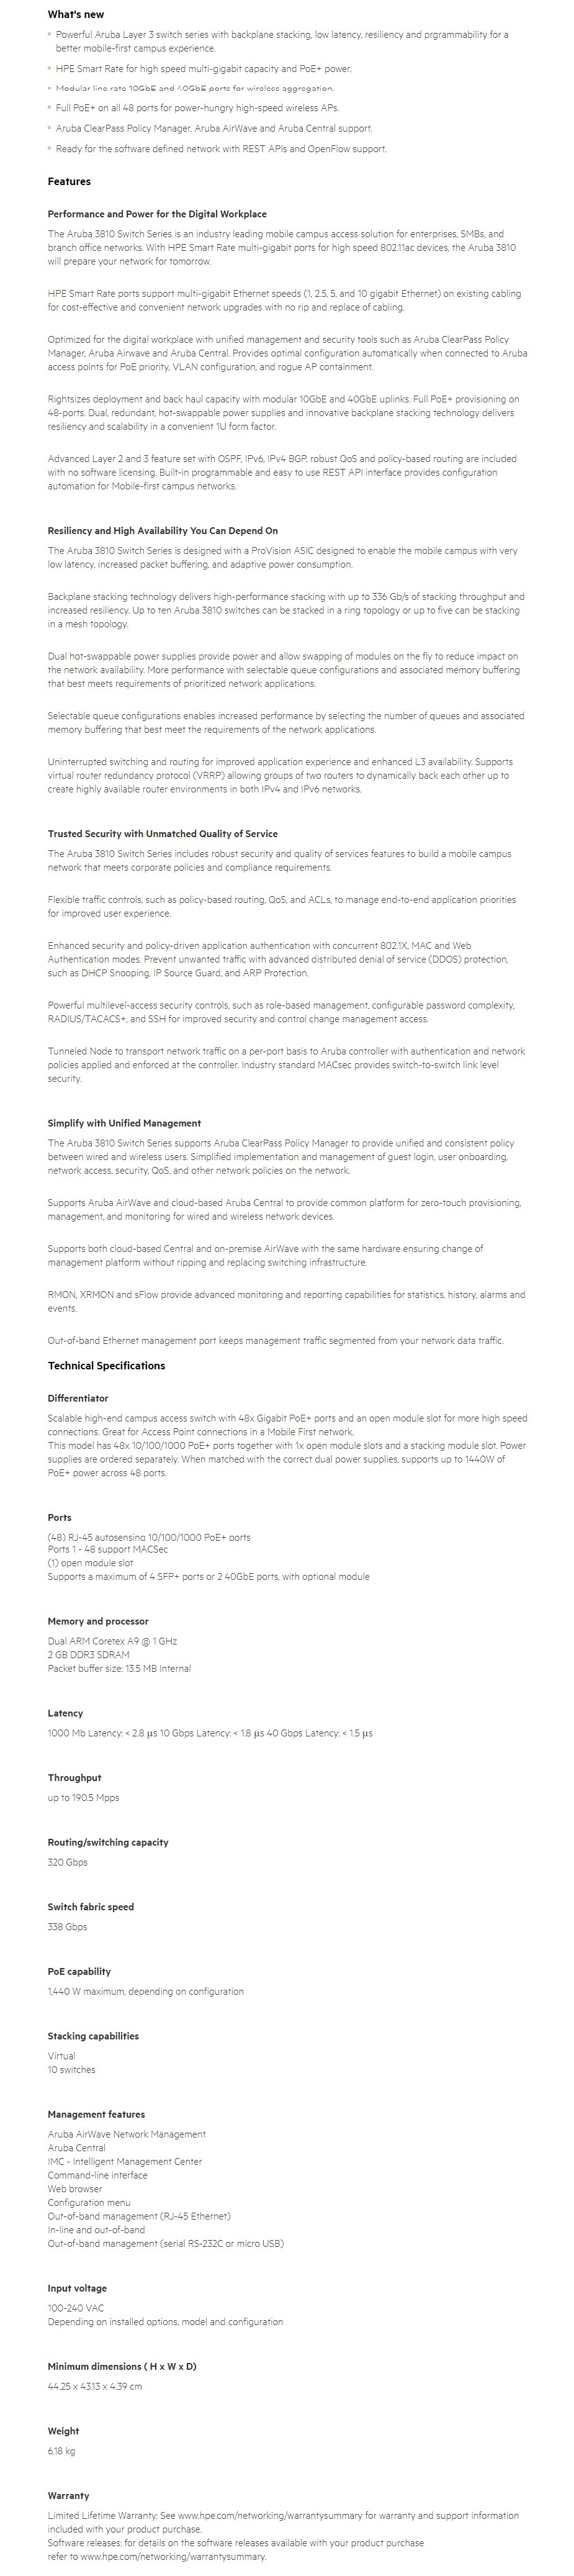 HPE Aruba 3810M 48-Port GbE MACSec PoE+ 1440W Switch - No PSU - Overview 1